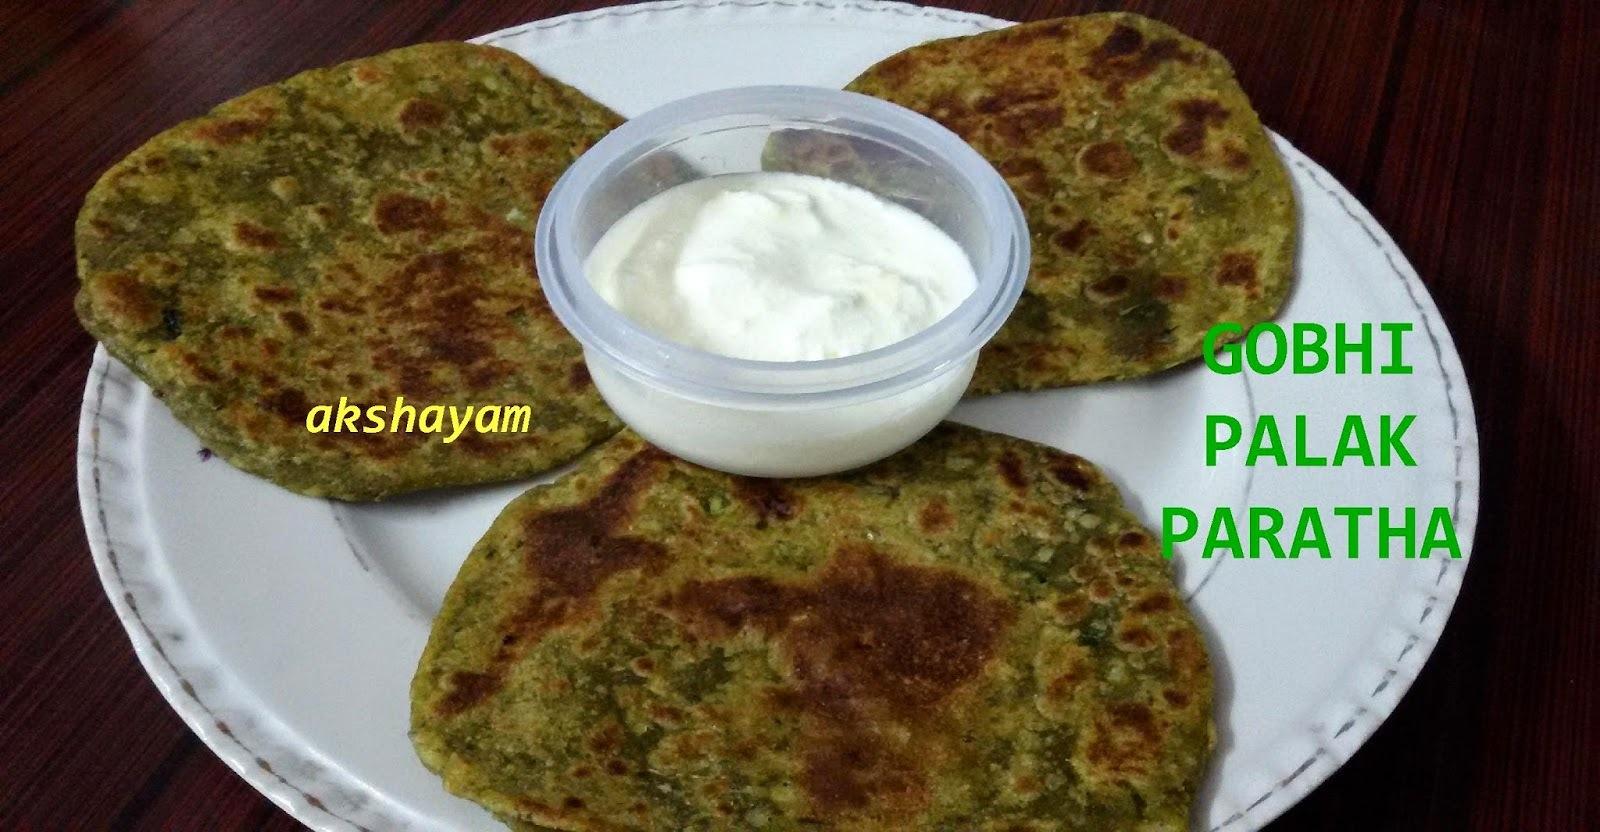 Broccoli-Palak Paratha